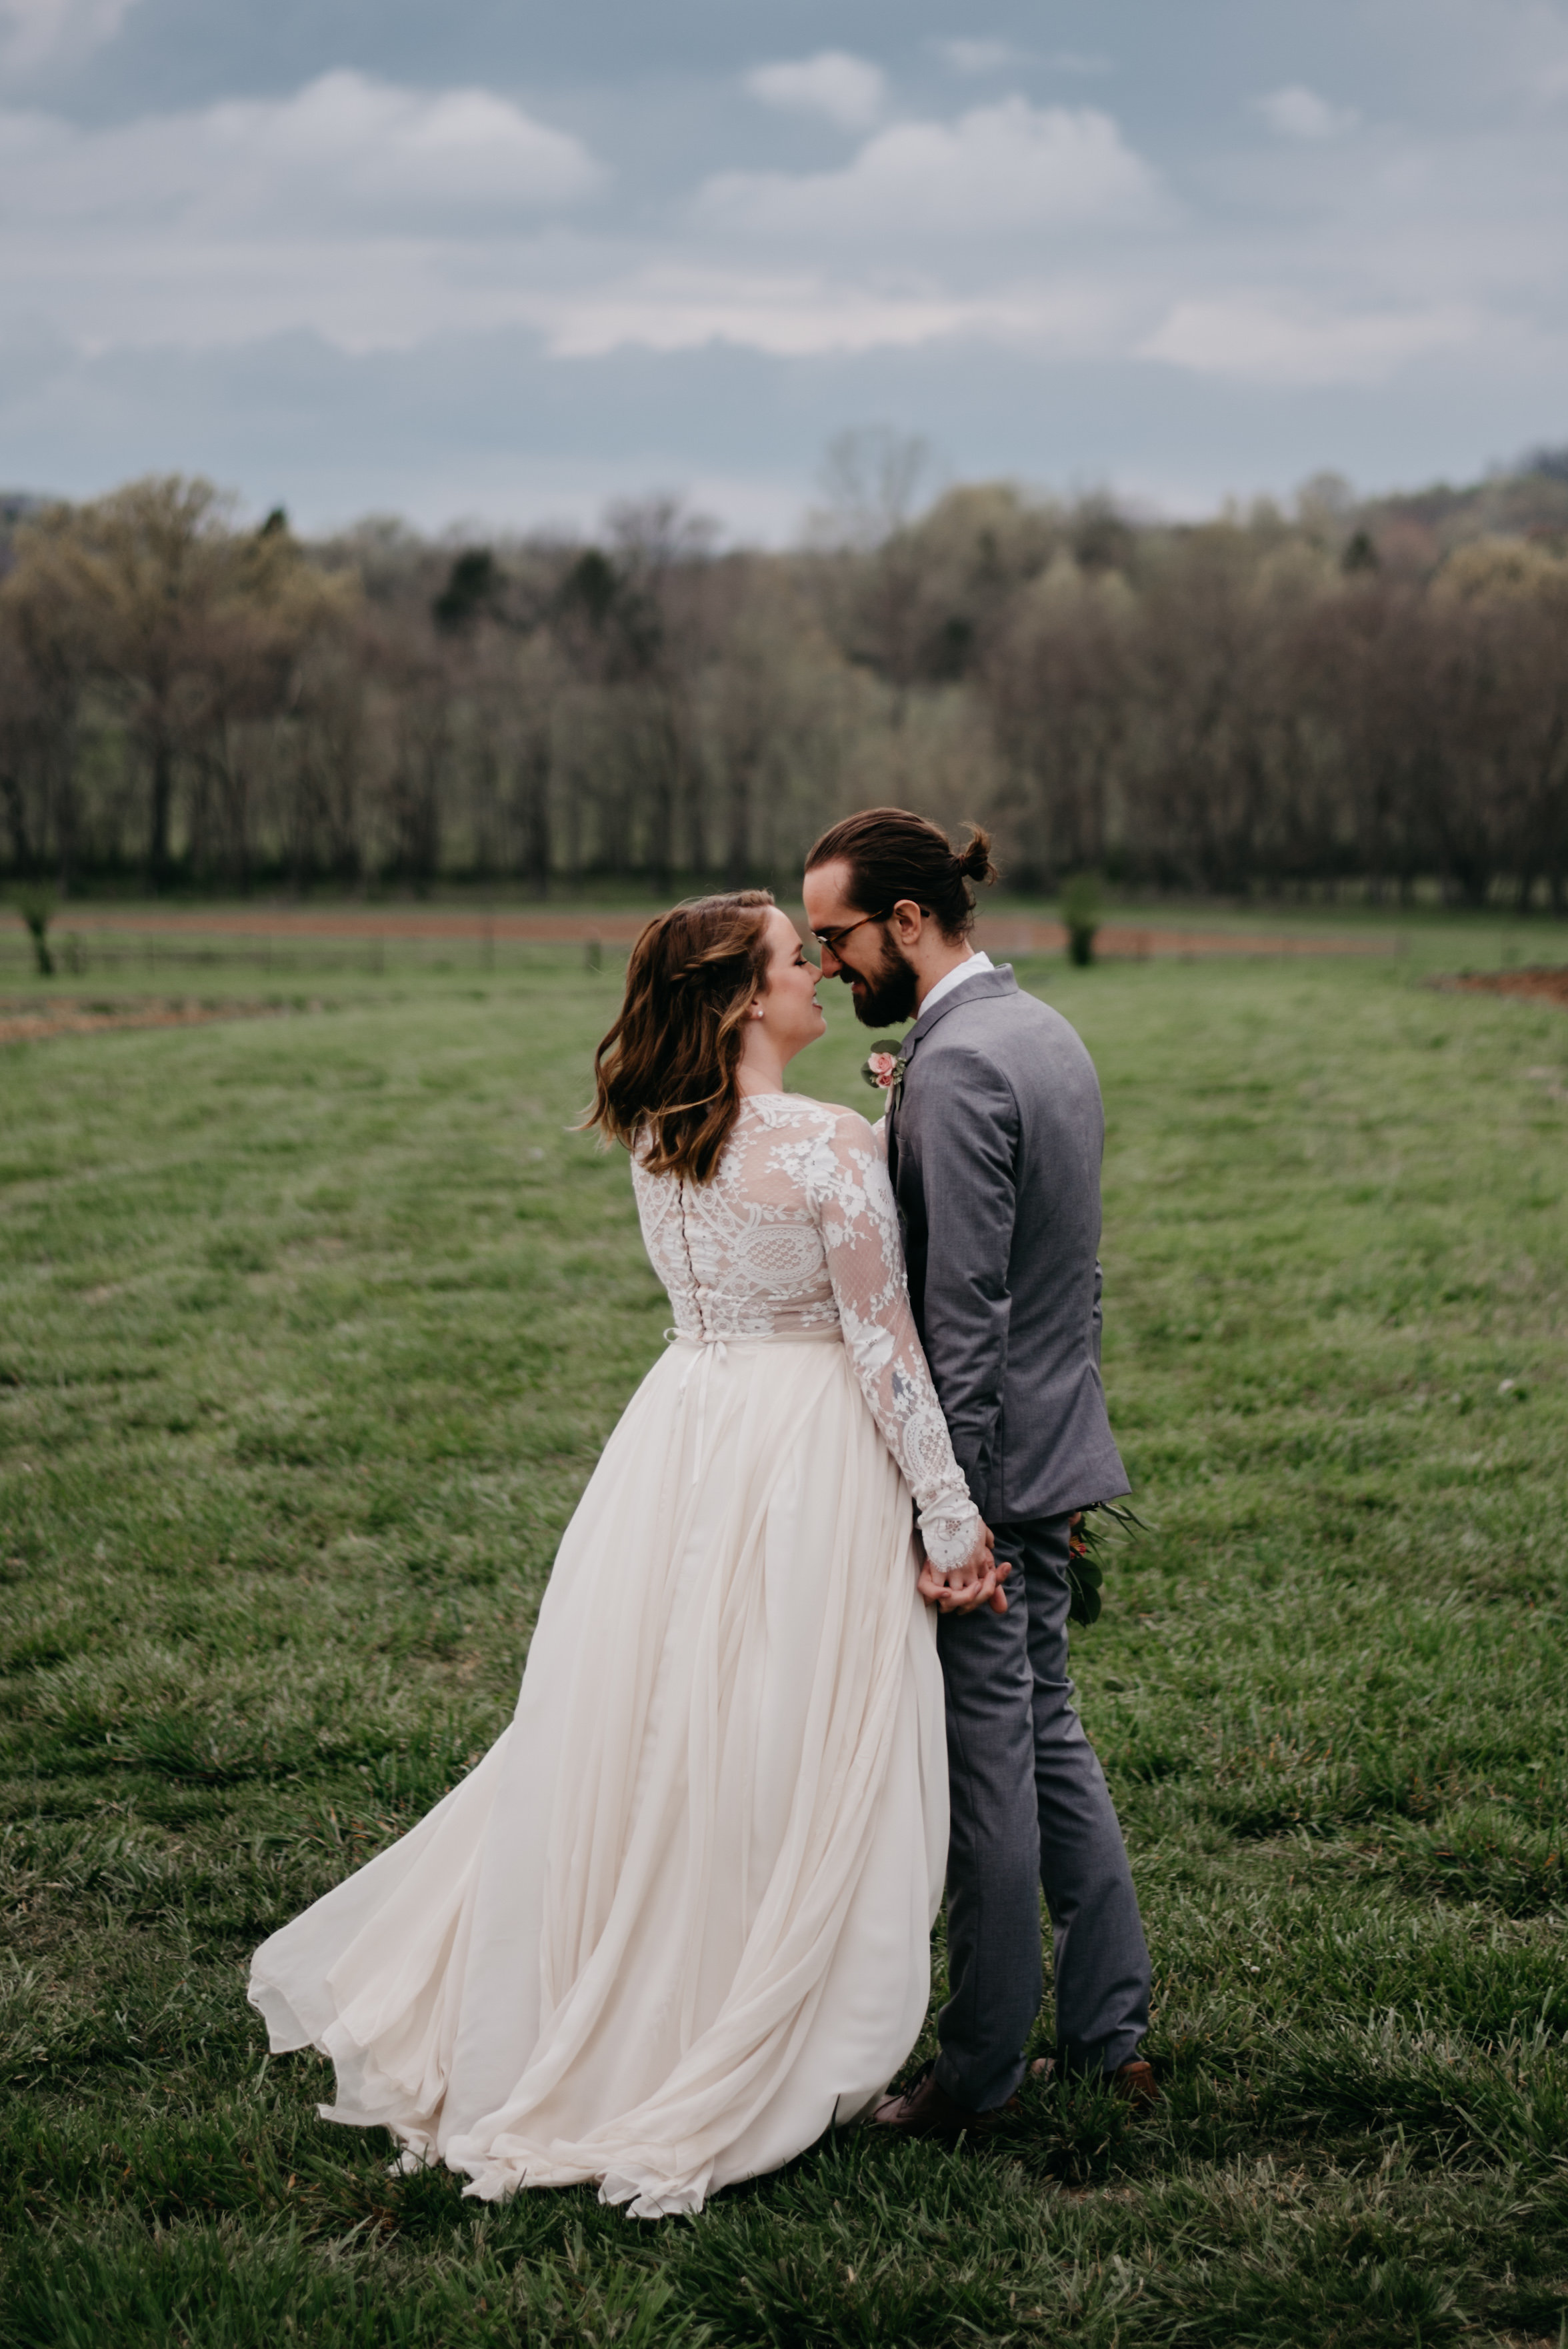 Allenbrooke-Farms-Nashville-Wedding-Photographers 24.jpg